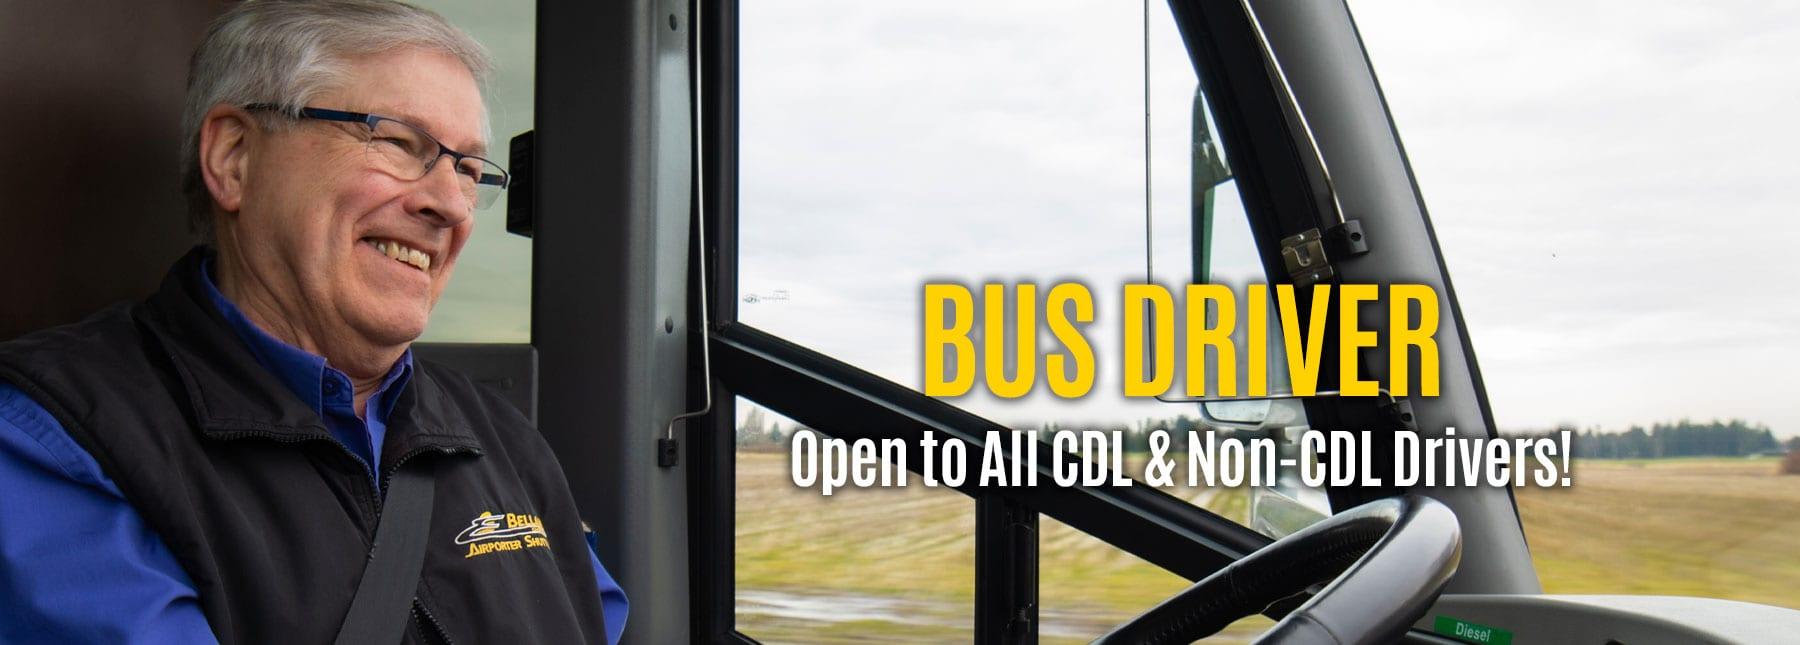 Bus Driver 1 20210706 1800x645